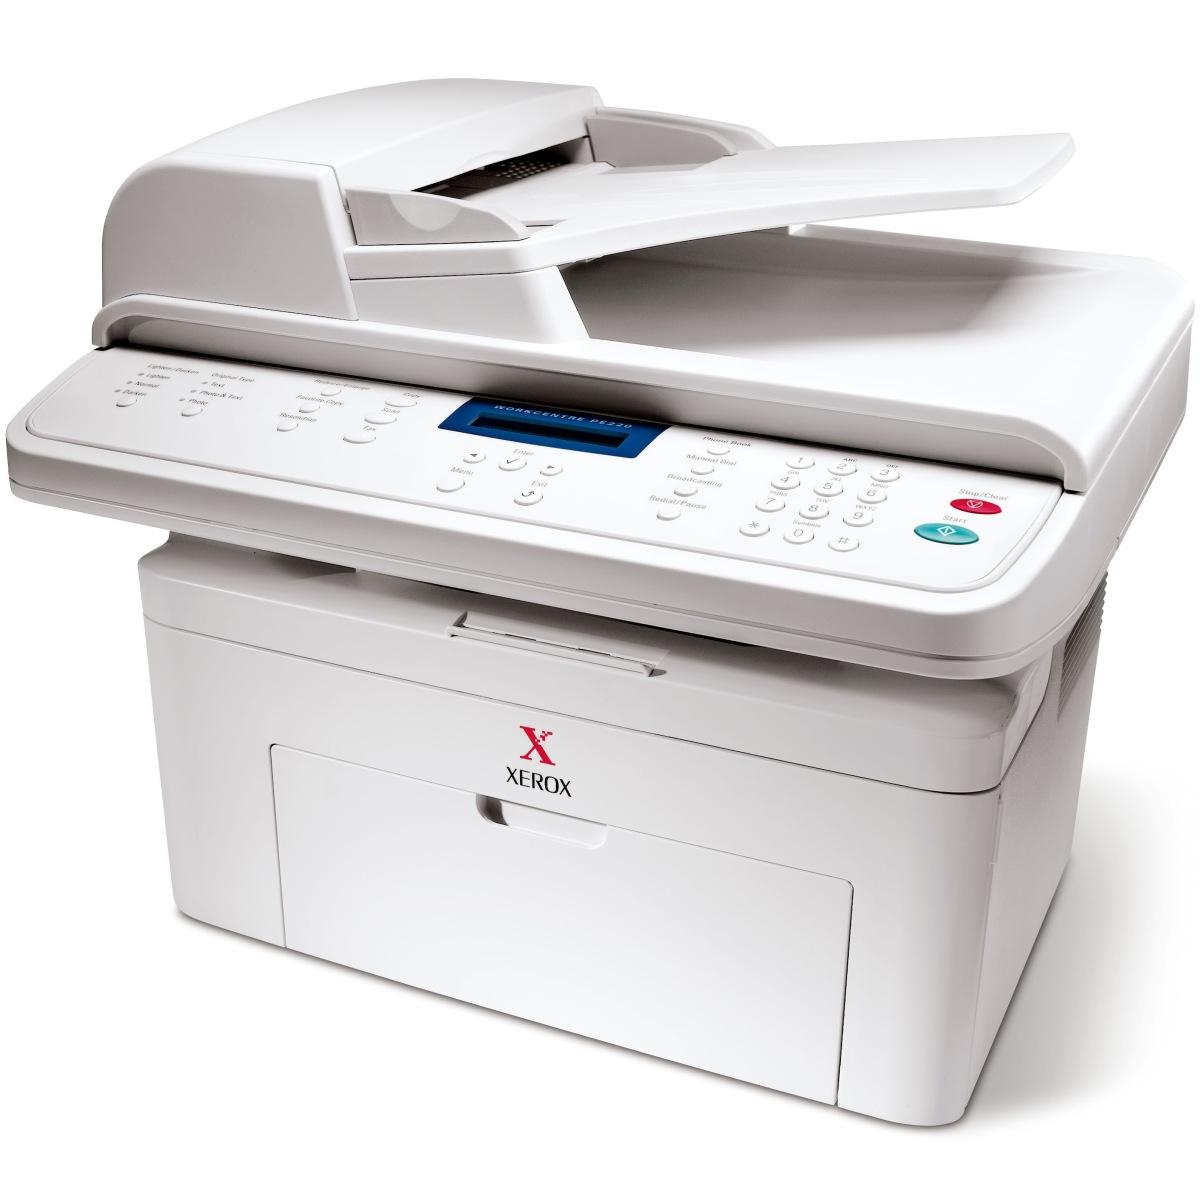 18442360741 Dell Printer Customer Care Number